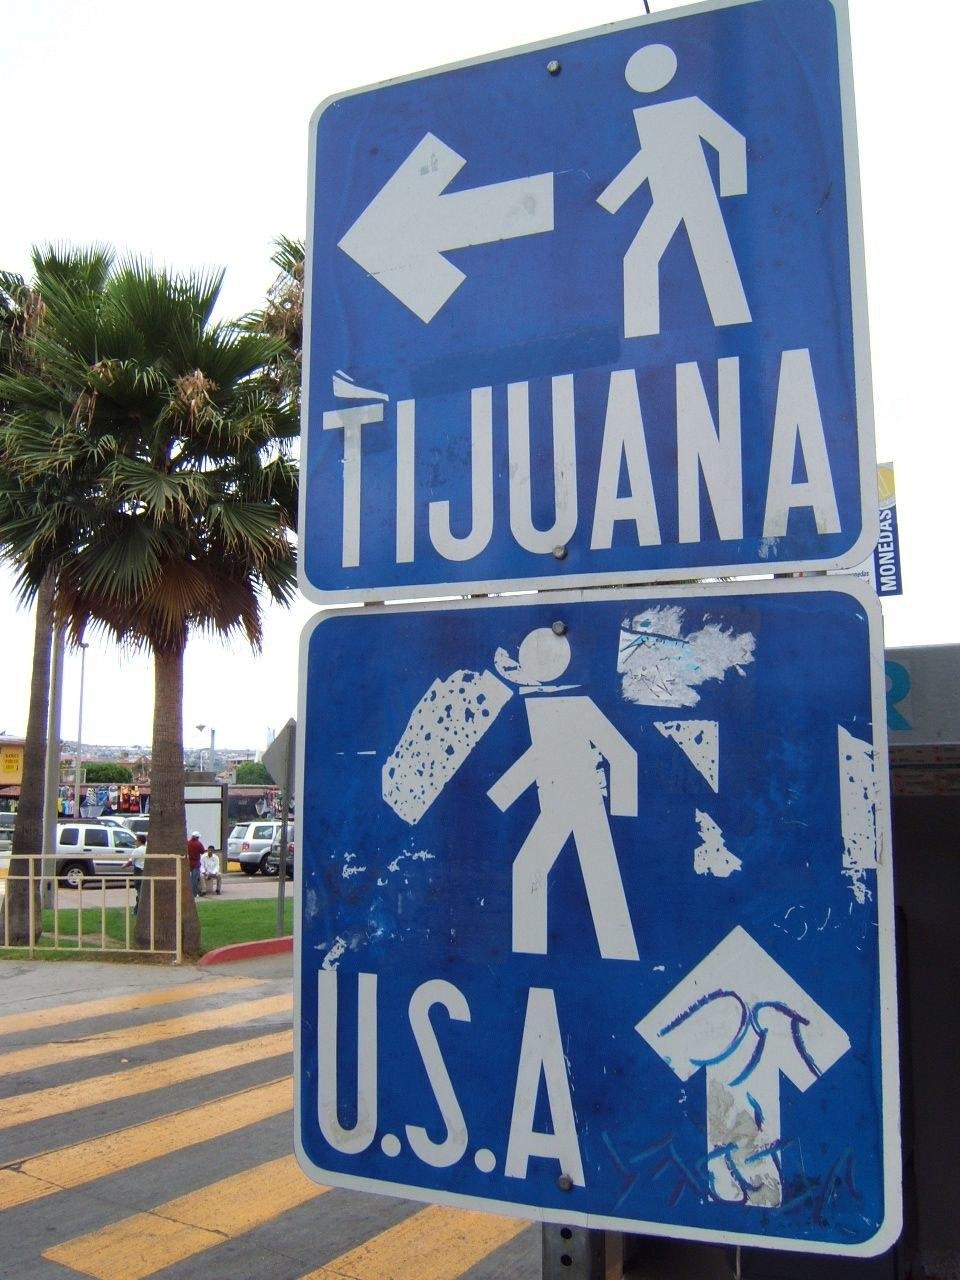 Pedestrian border crossing sign Tijuana Mexico